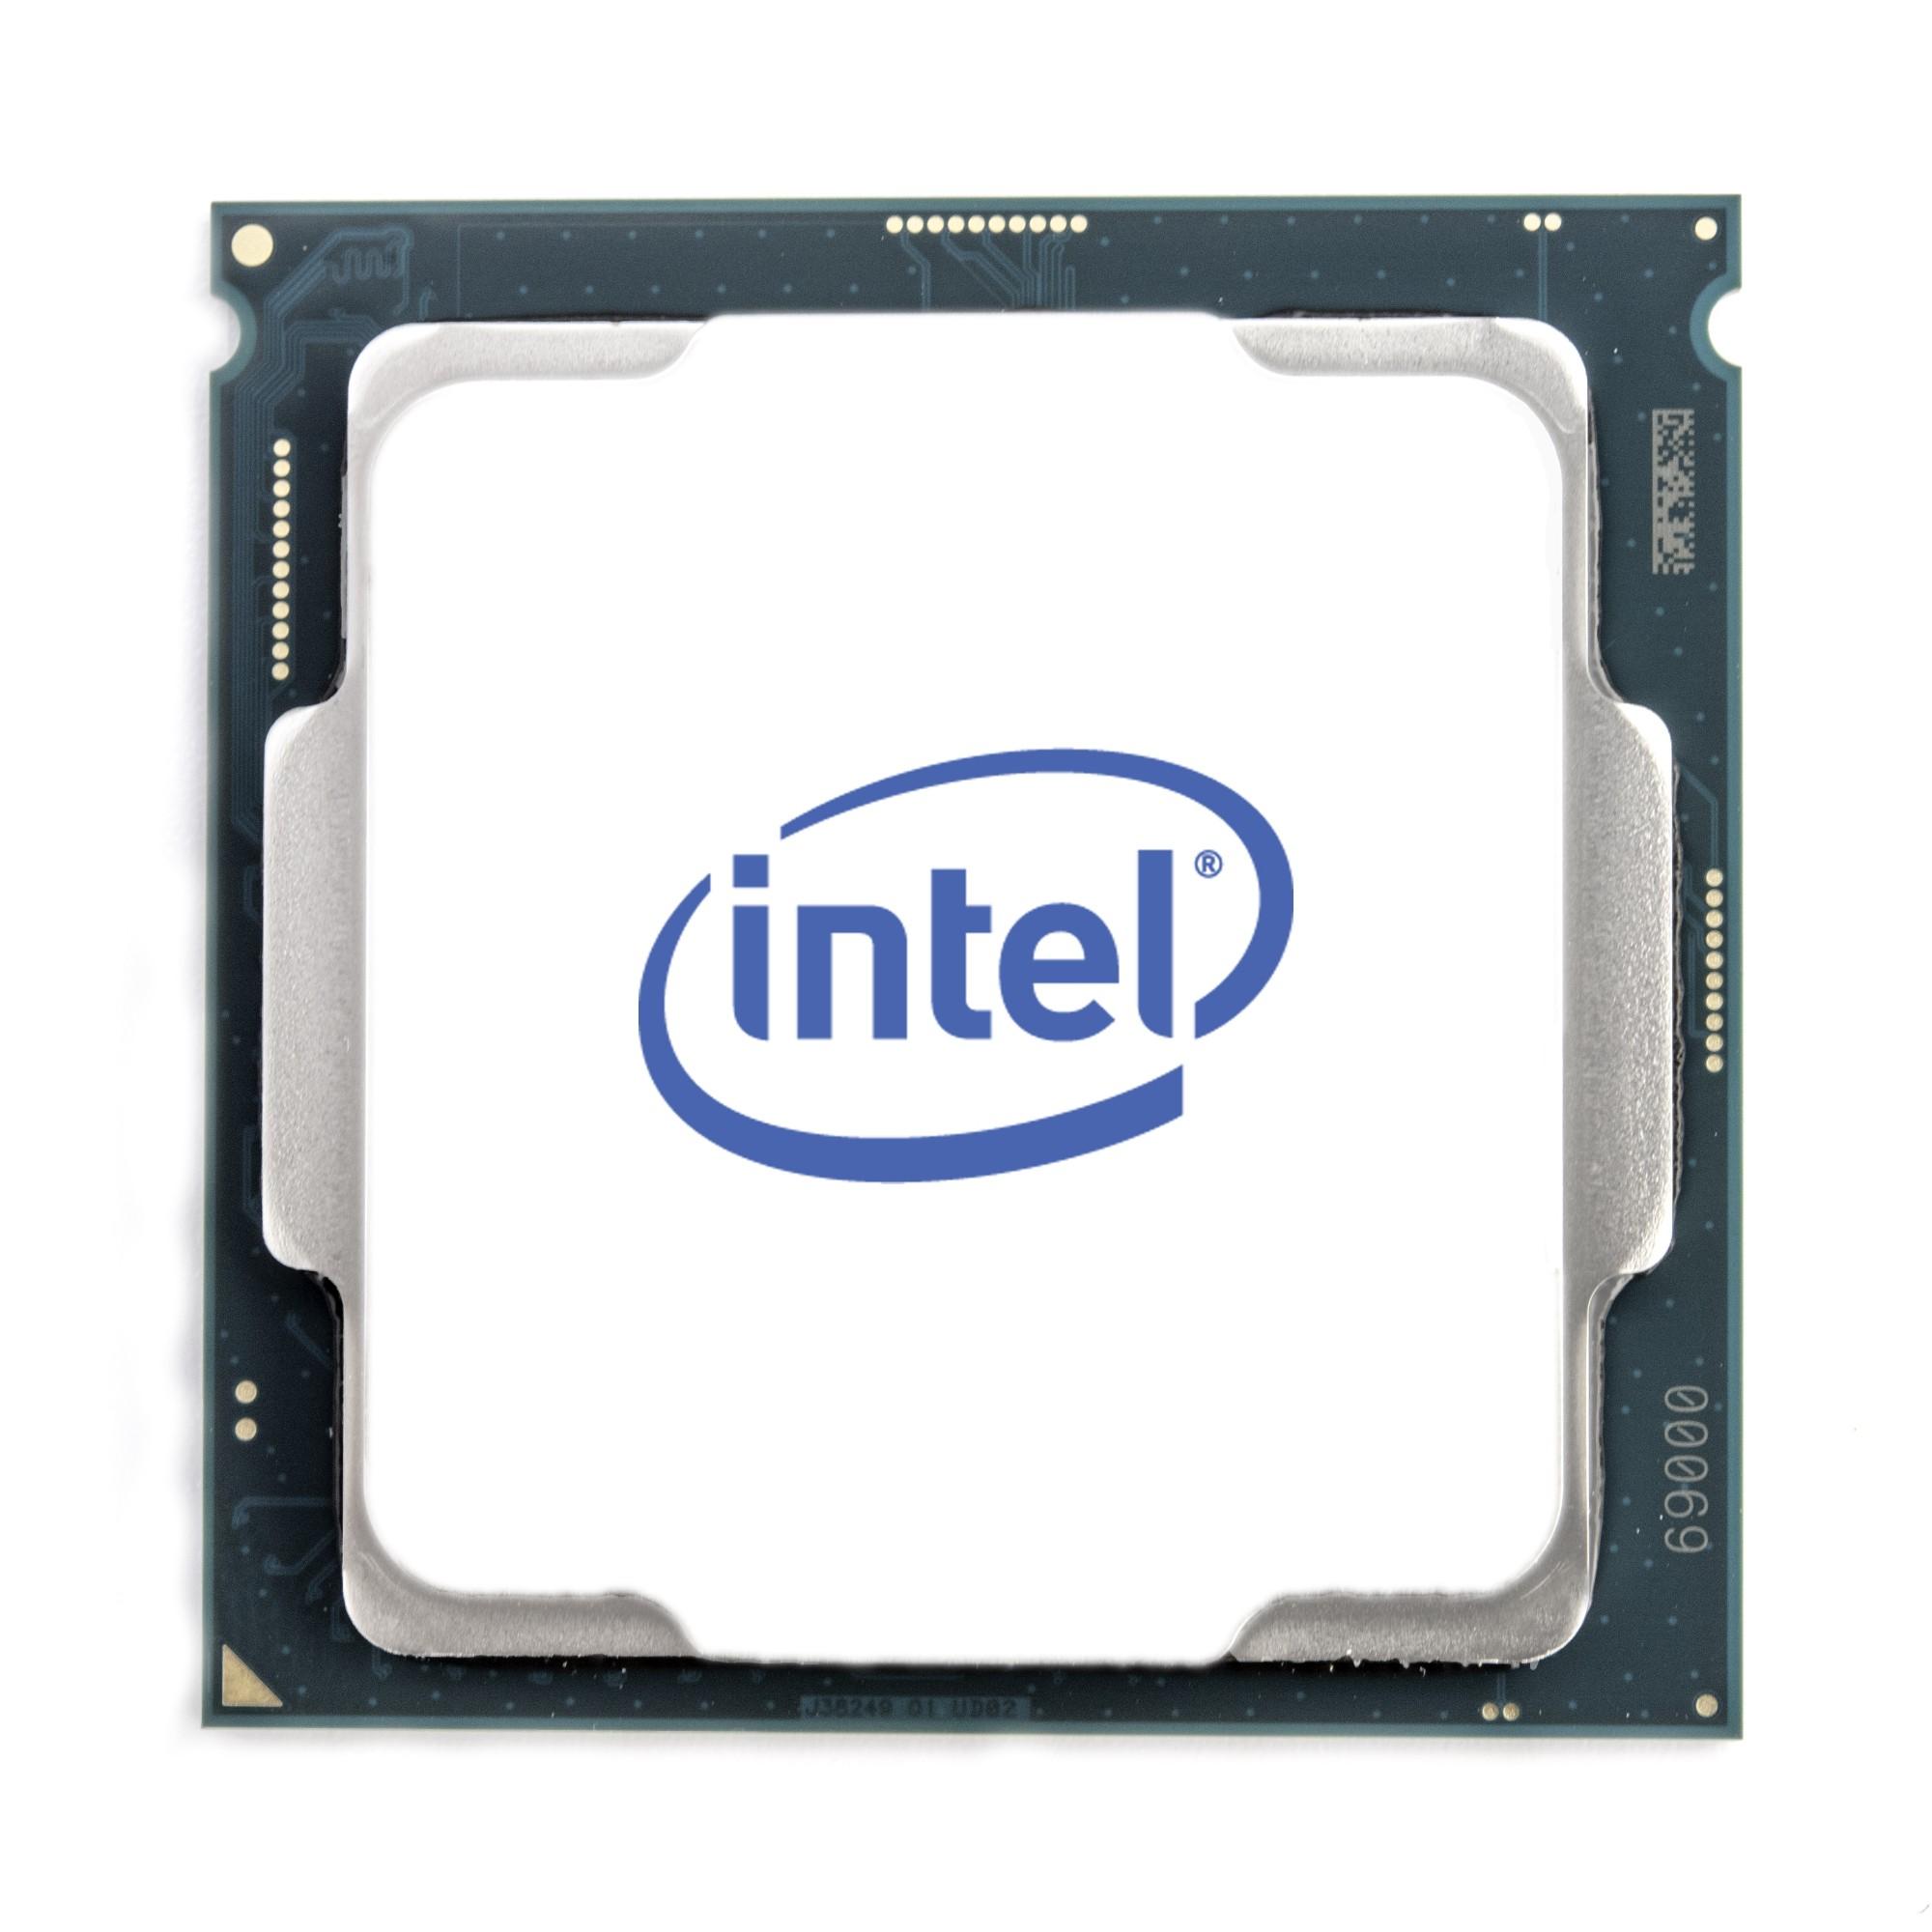 Intel Xeon E-2226G processor 3.4 GHz Box 12 MB